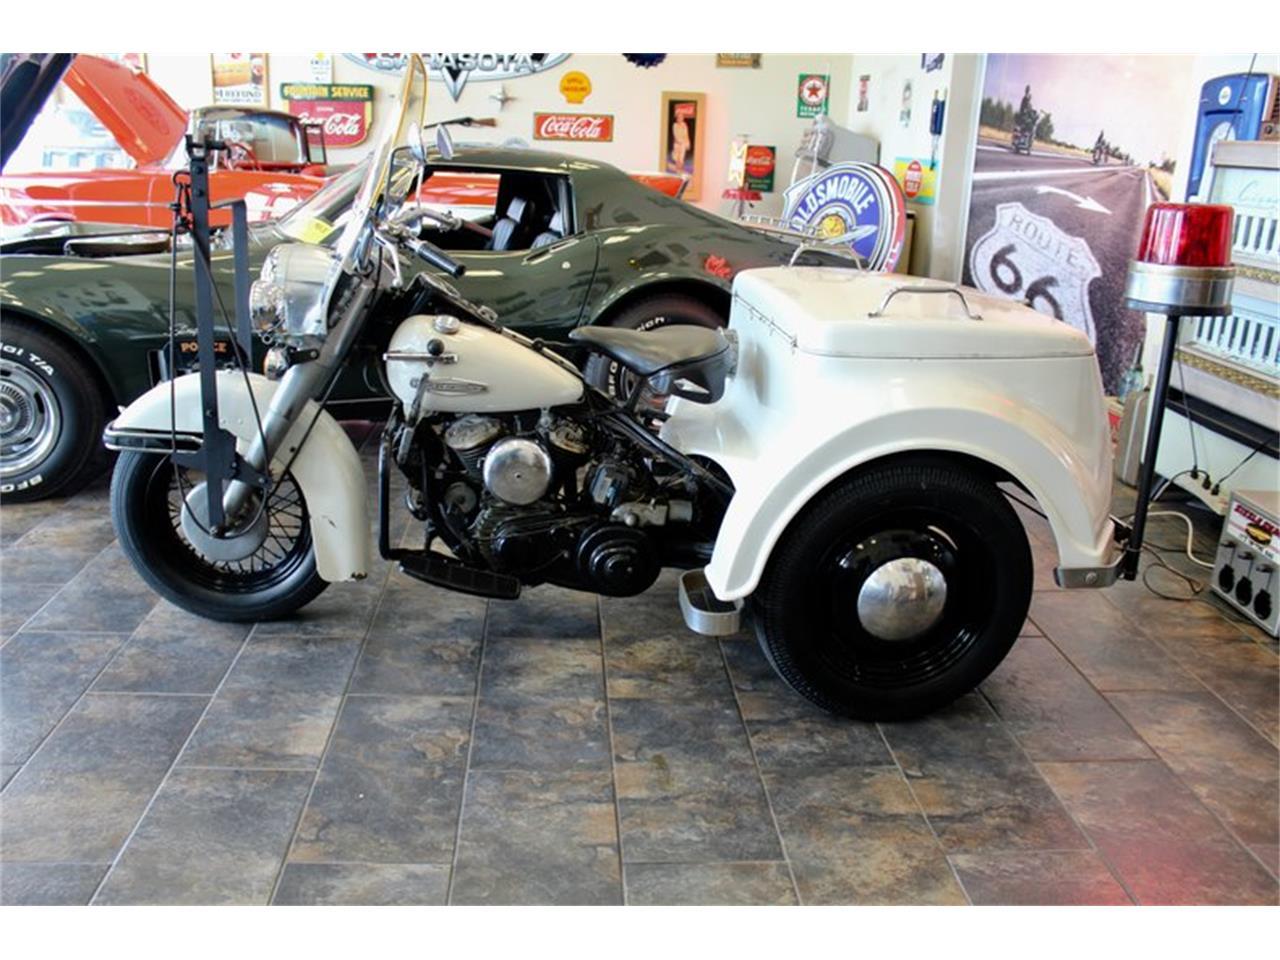 For Sale: 1967 Harley-Davidson Motorcycle in Sarasota, Florida